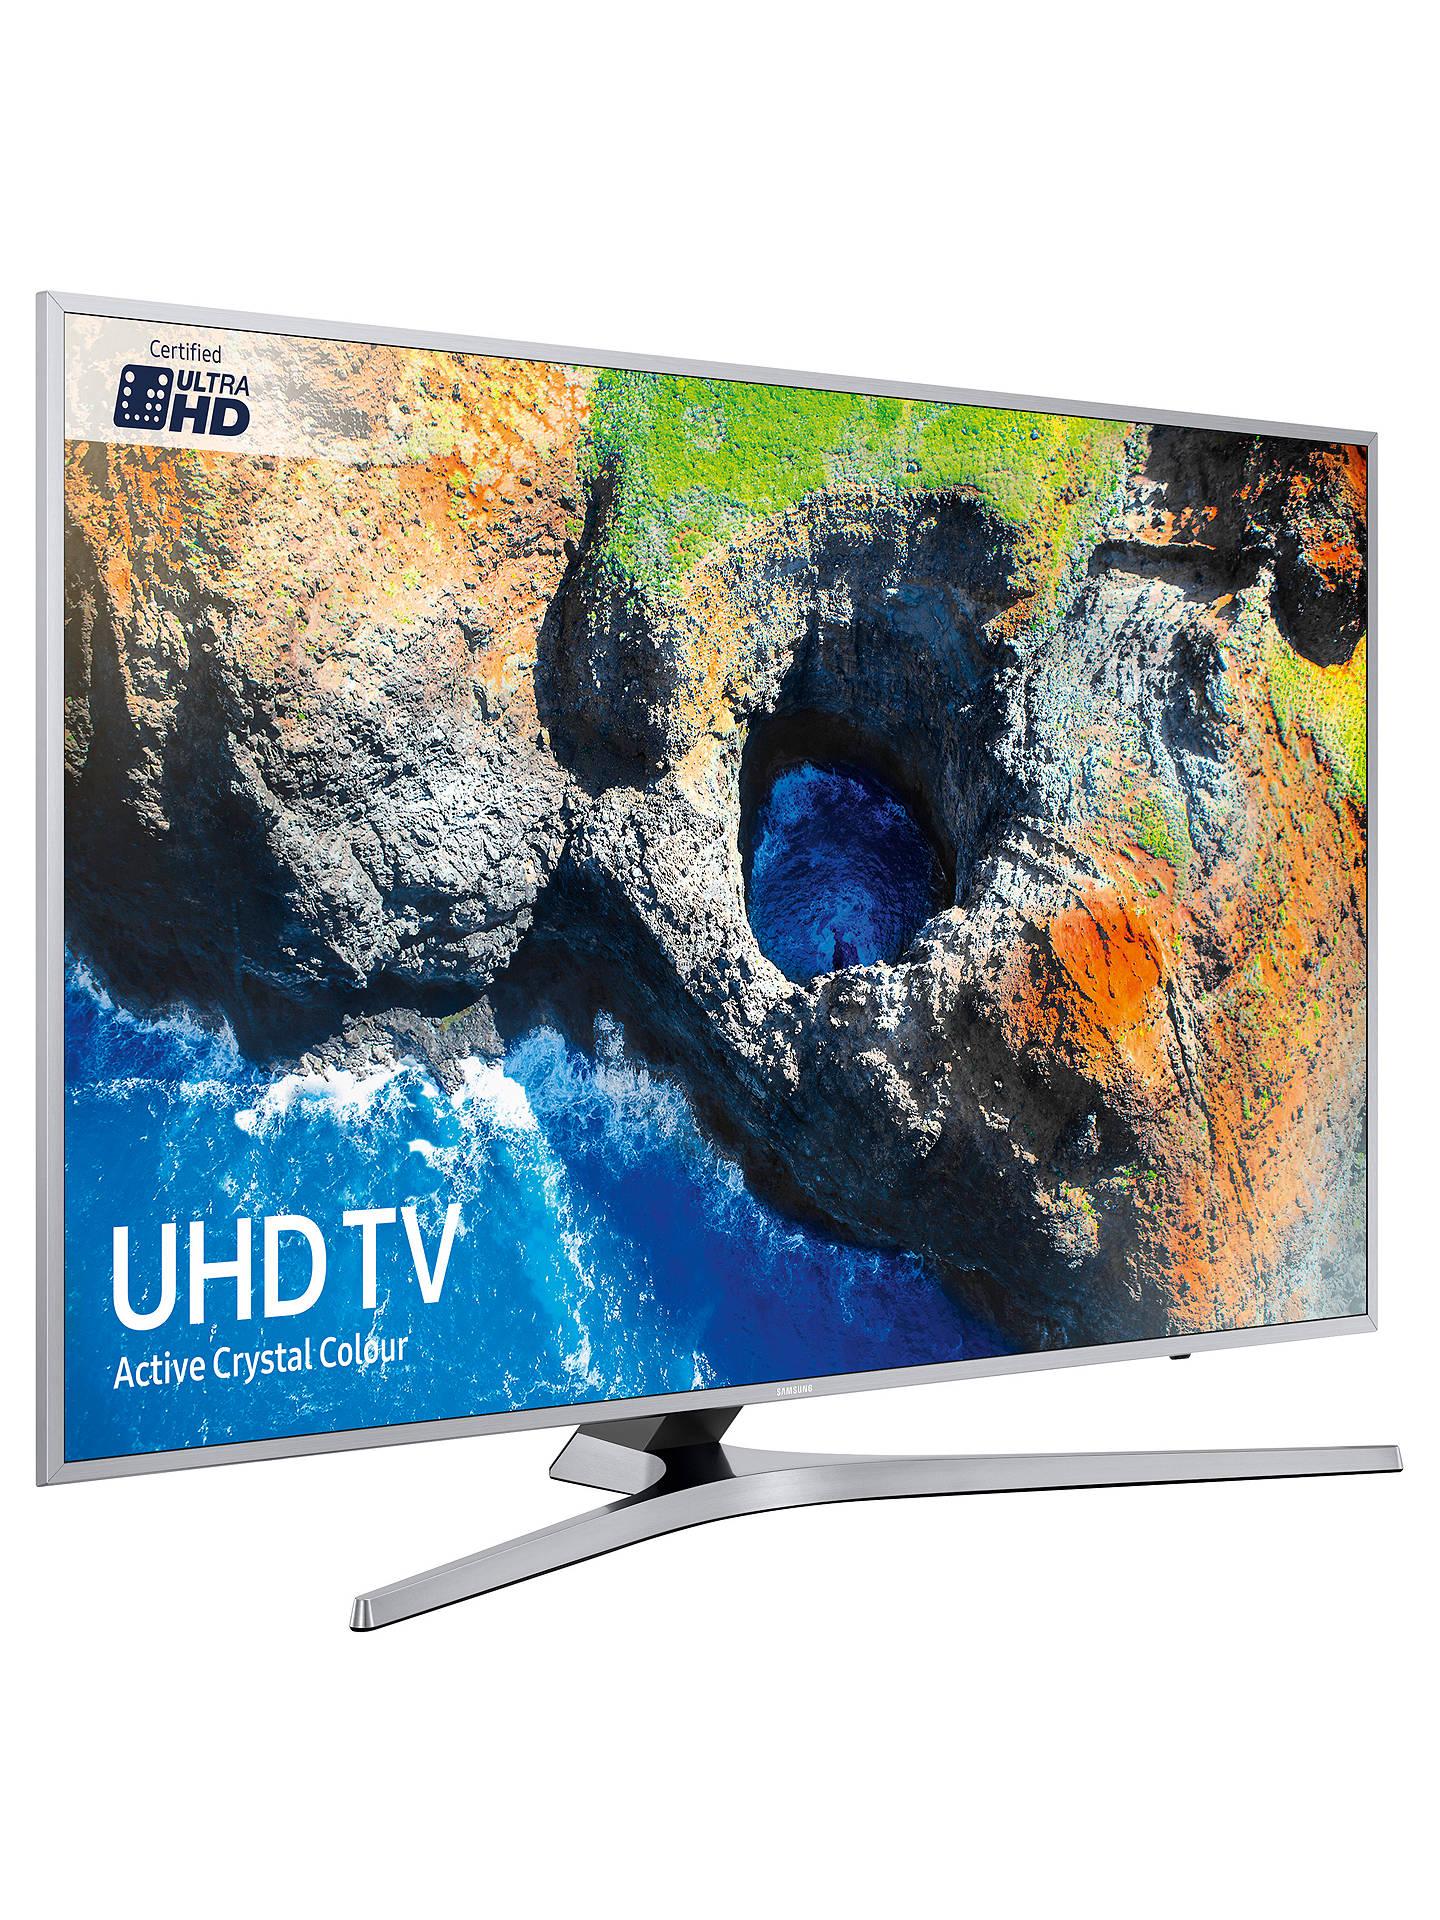 e3cd55939772 ... Buy Samsung UE65MU6400 HDR 4K Ultra HD Smart TV